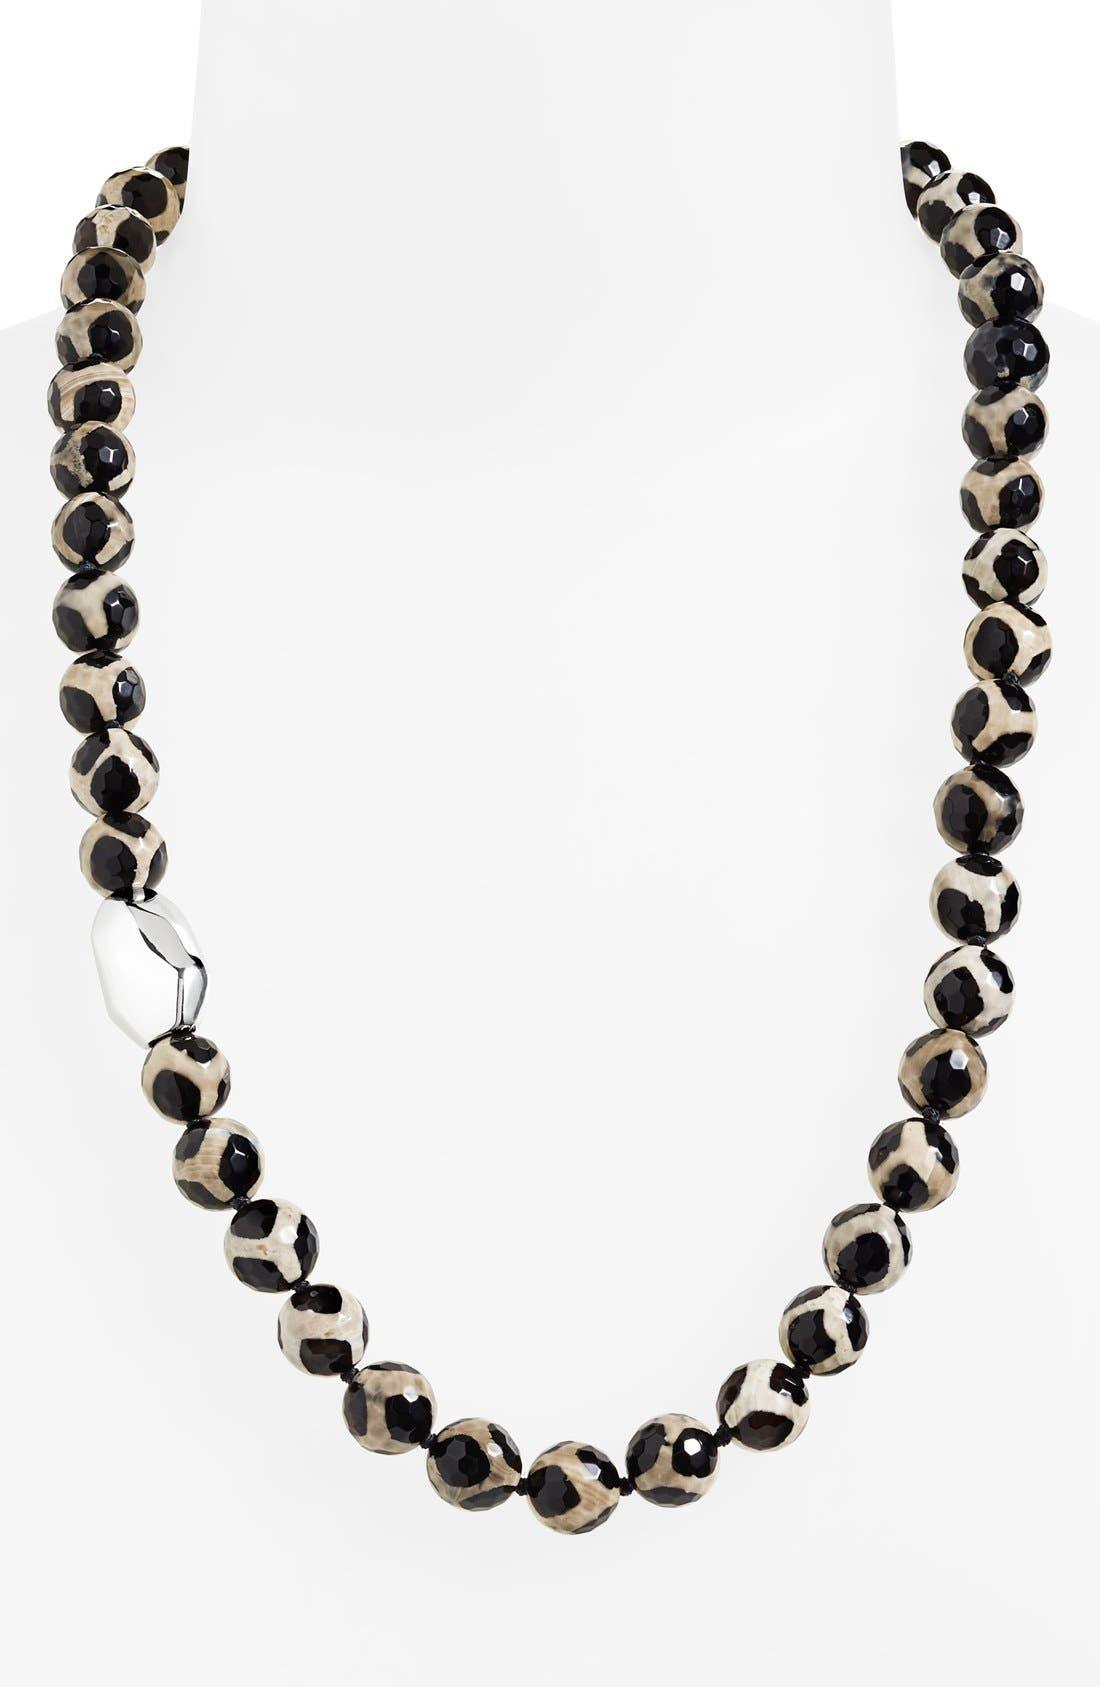 Simon Sebbag 'Safari' Beaded Necklace